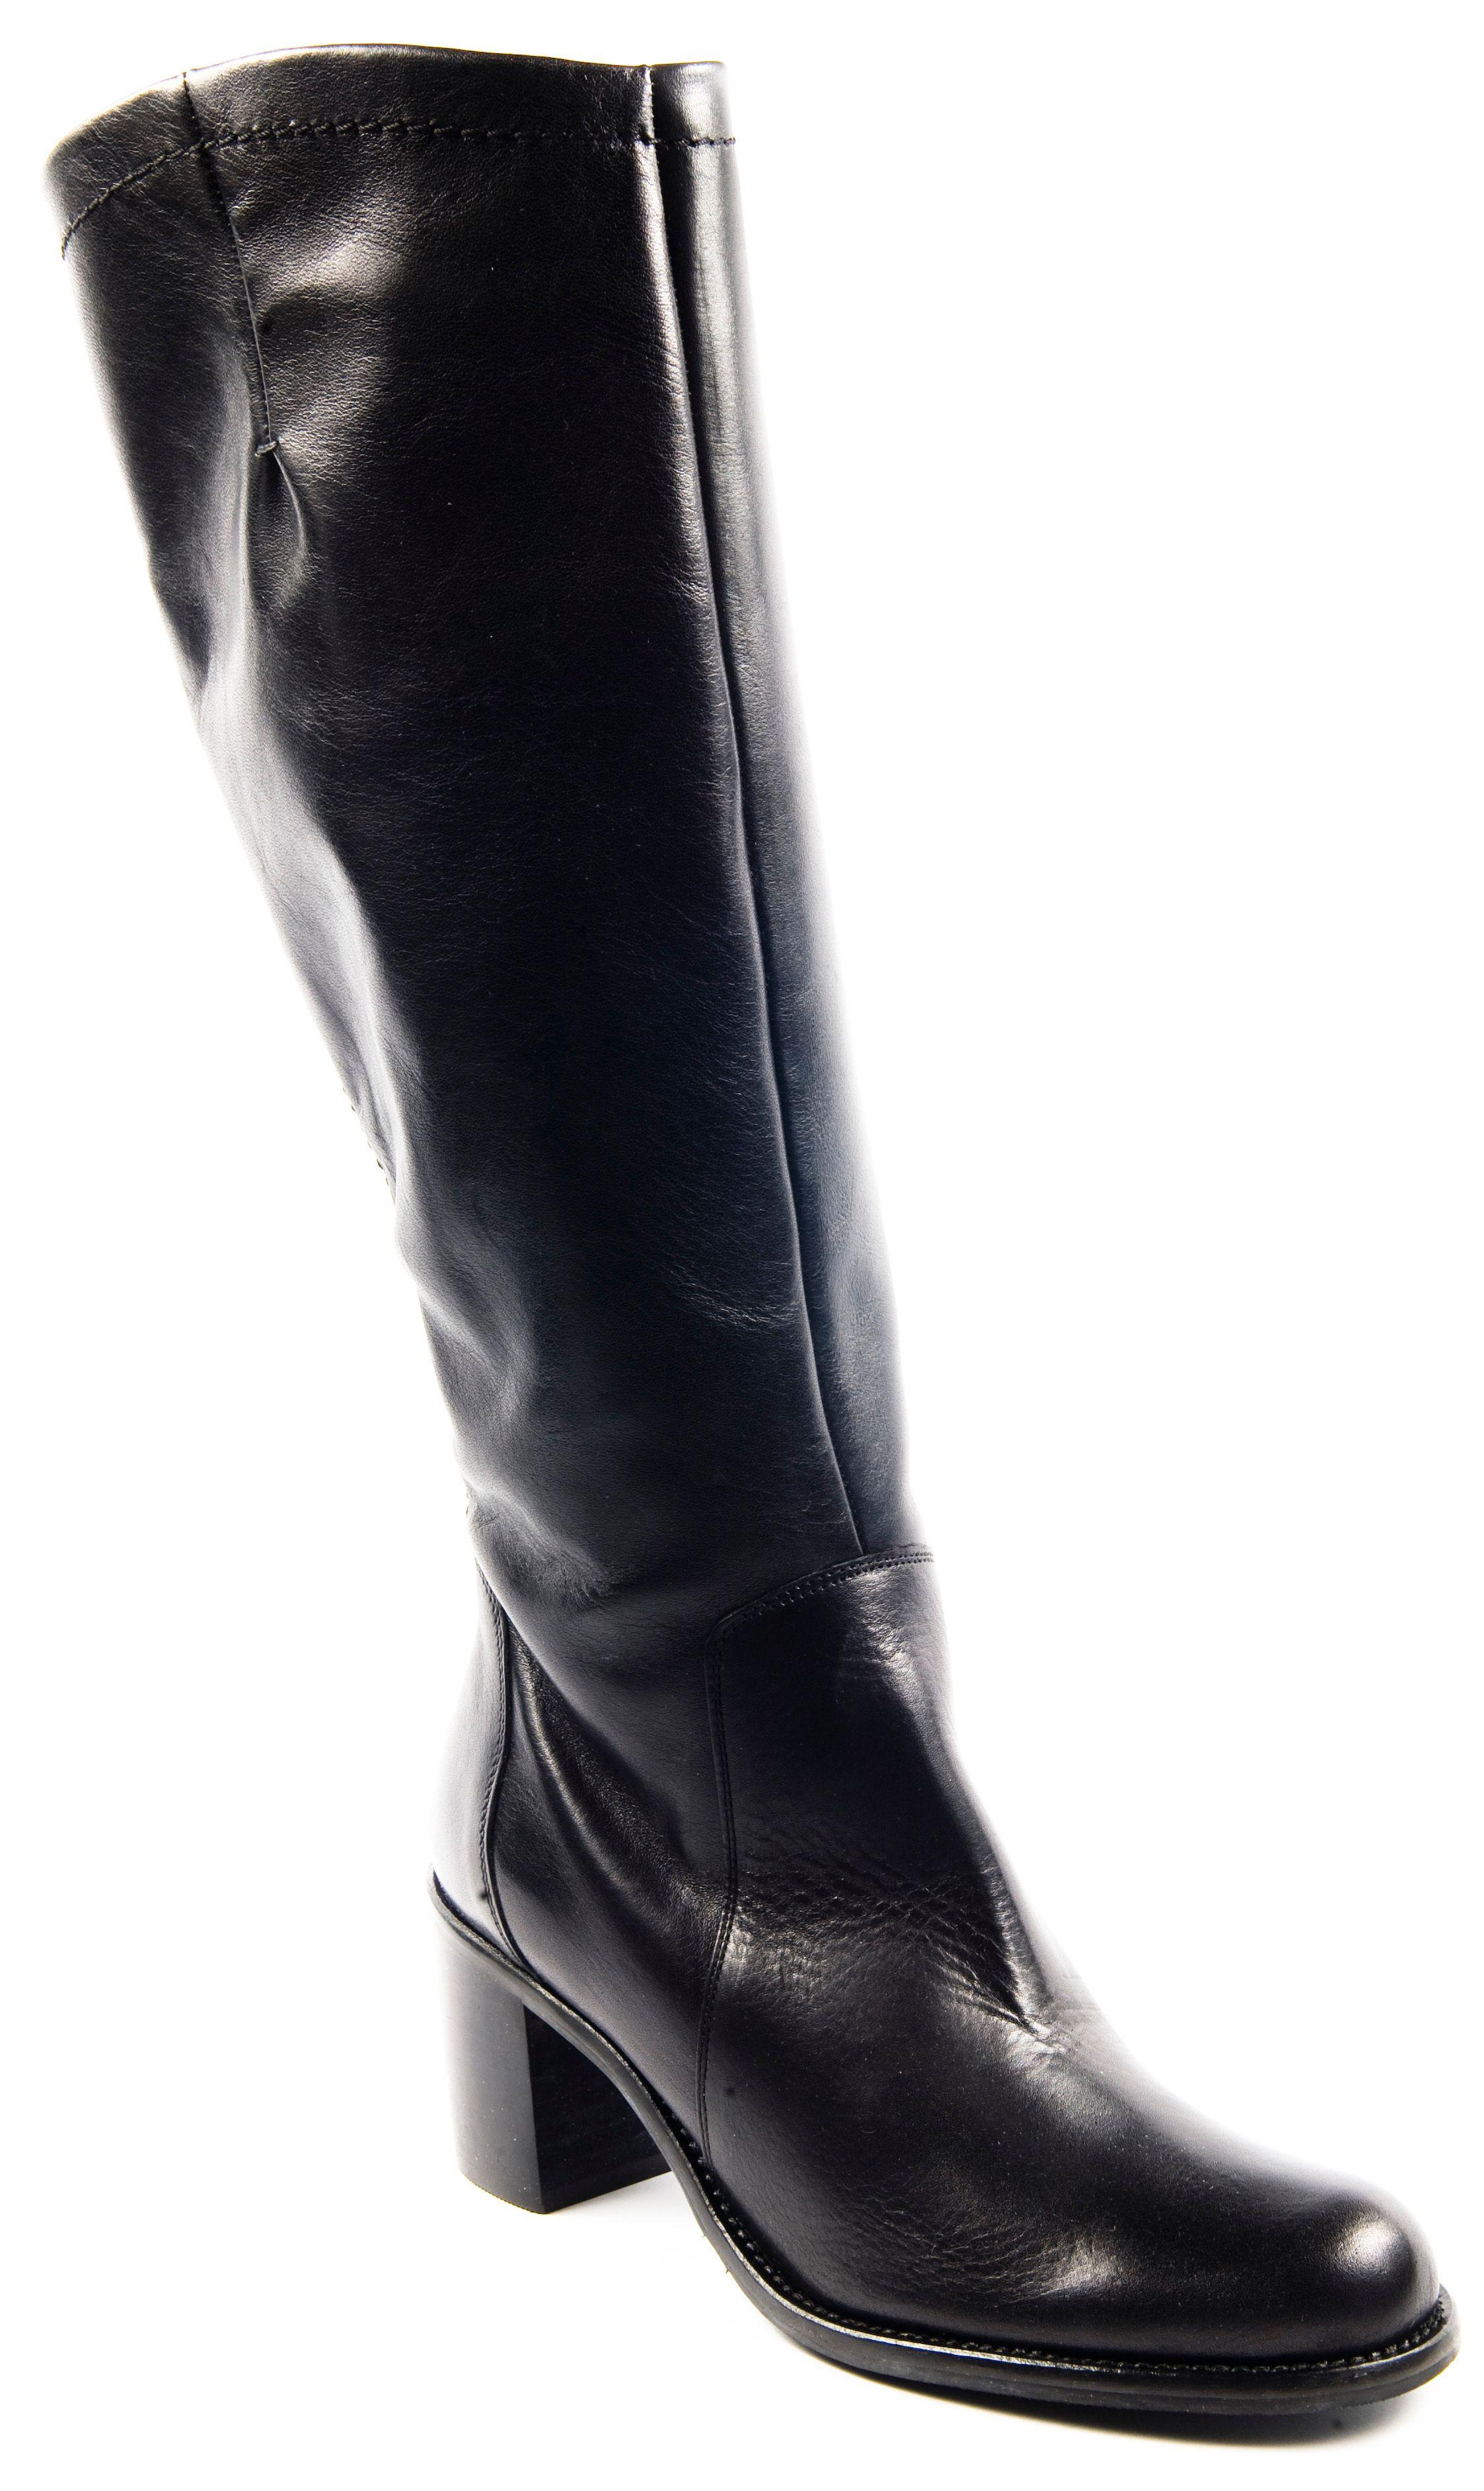 Jones Bootmaker Rye Long Boots in Black